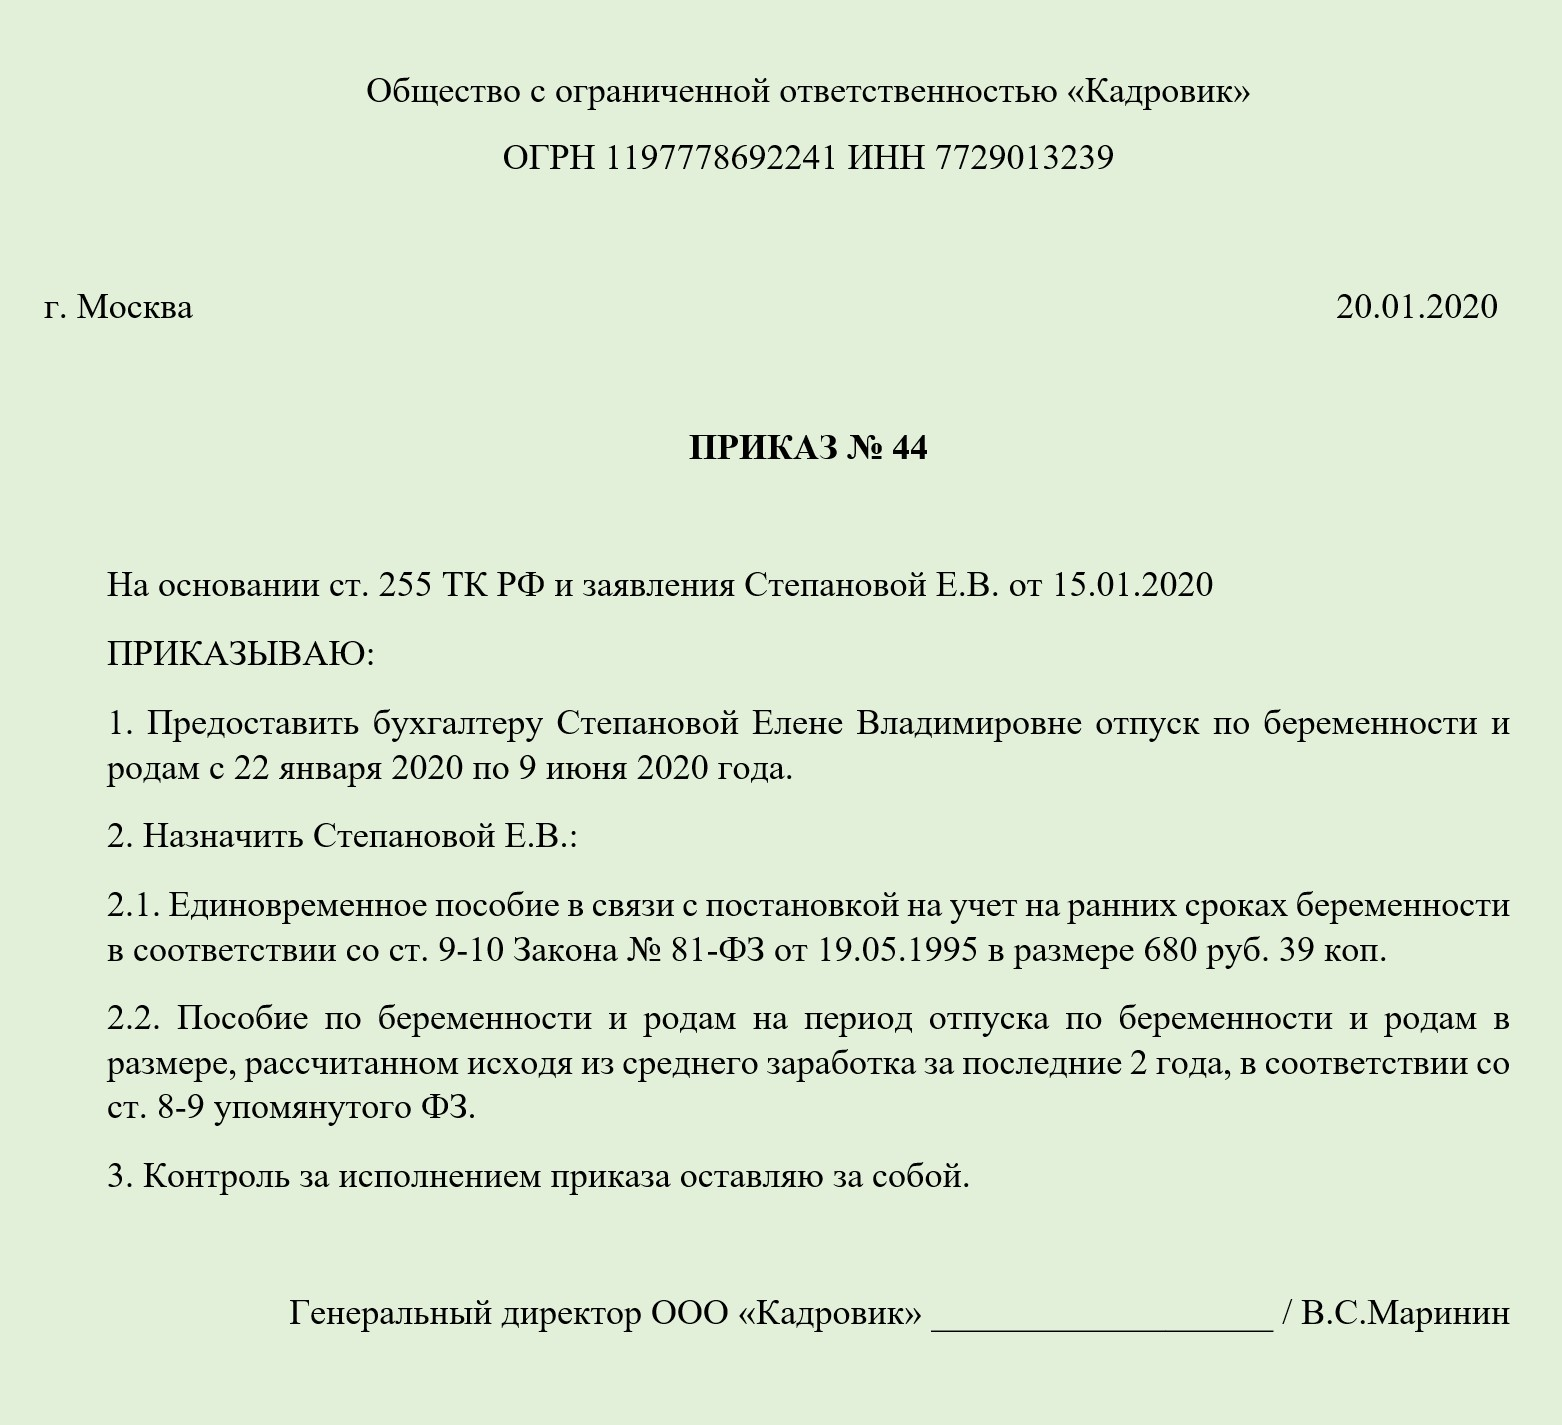 Prikaz na otpusk po BiR svob.forma